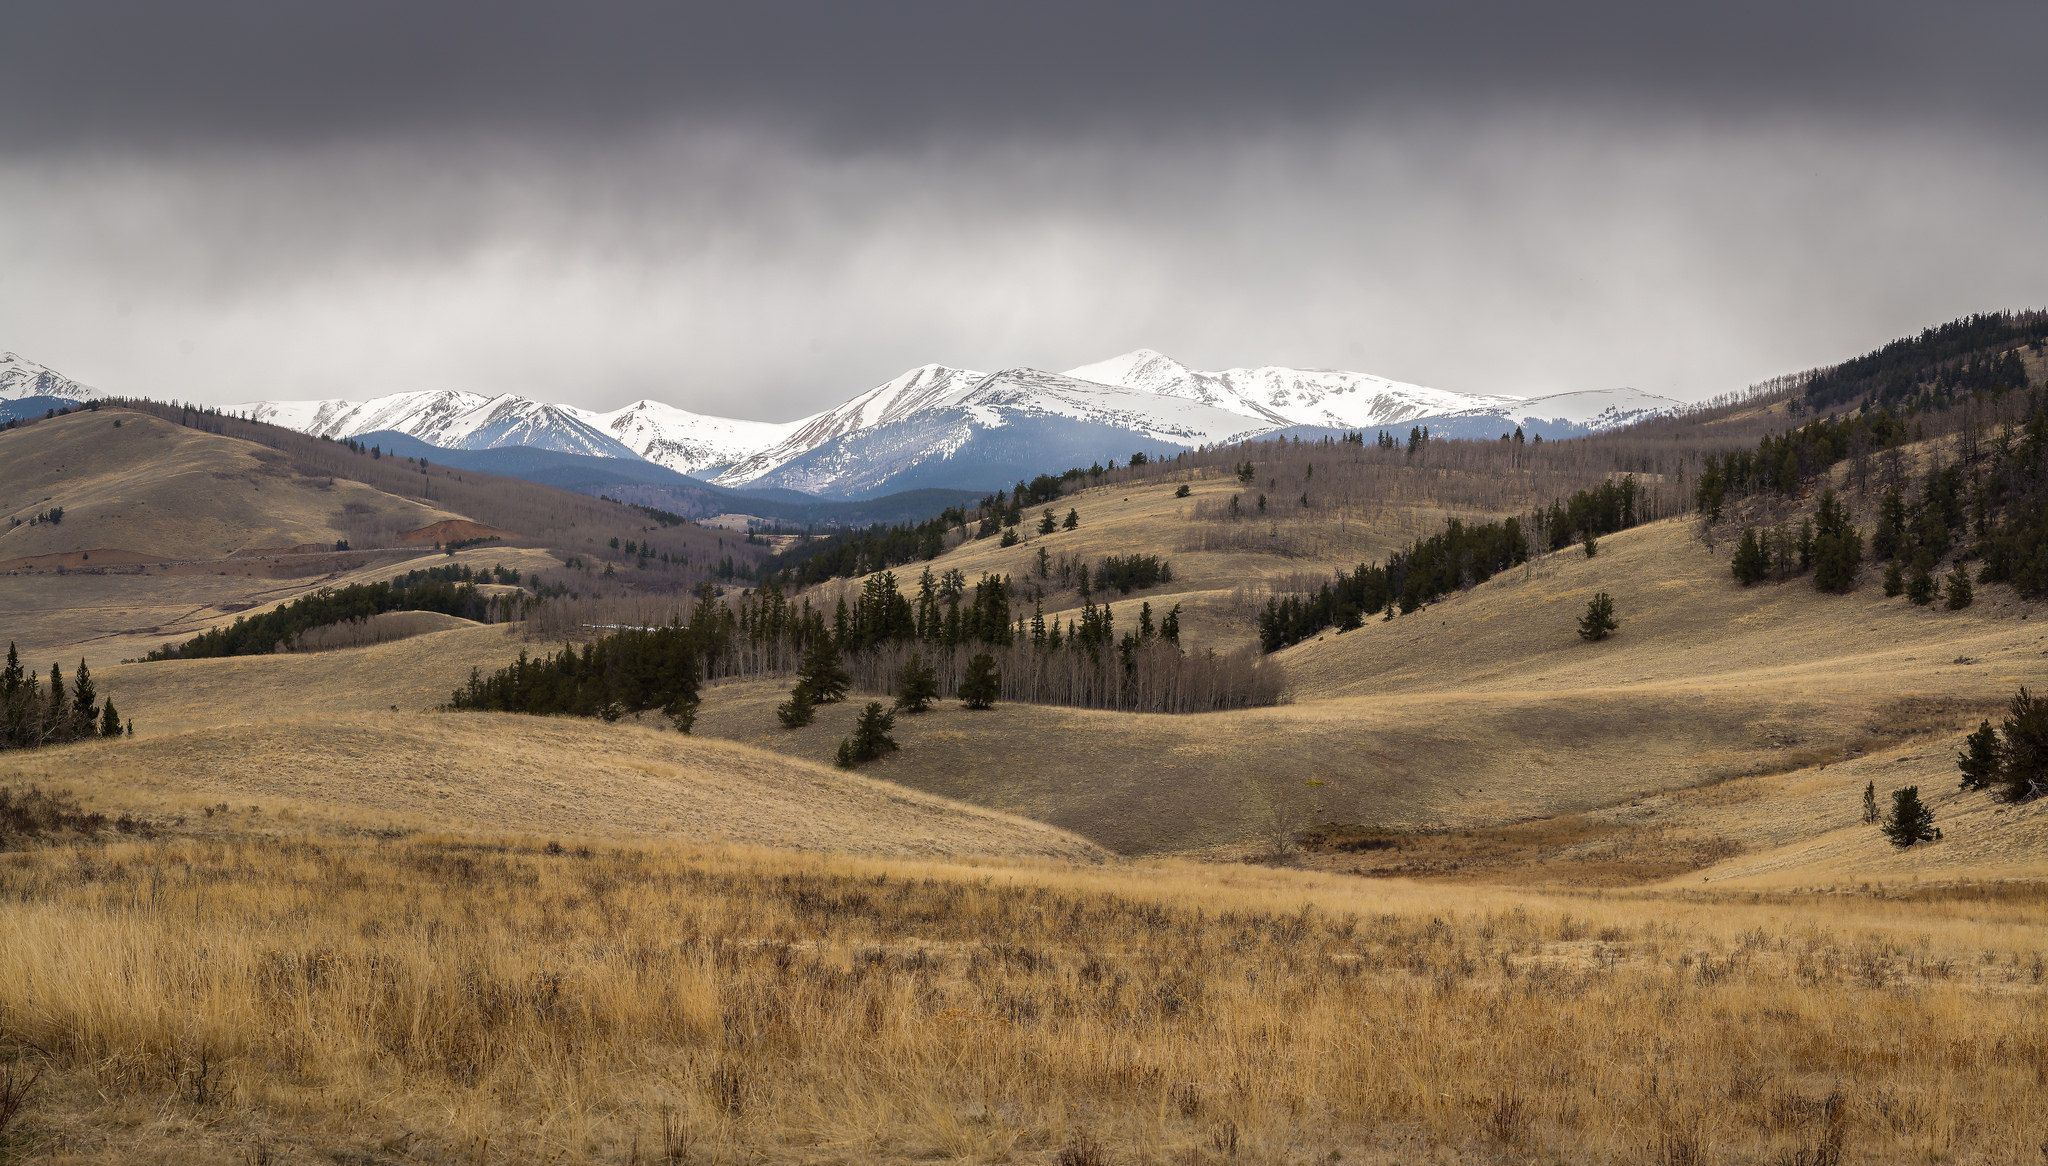 https://flic.kr/p/G16x2H | Colorado Spring Storm